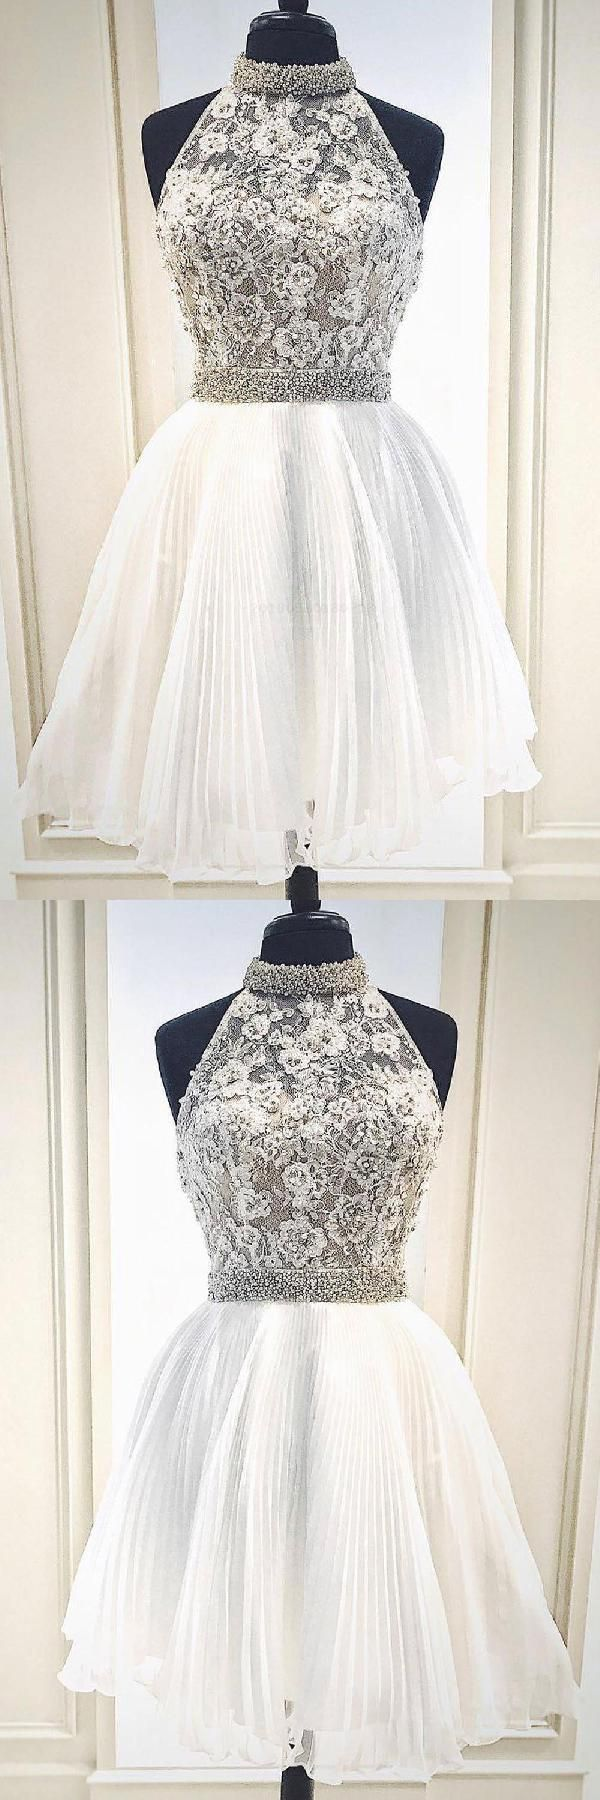 White prom dresses cute prom dresses white lace prom dresses